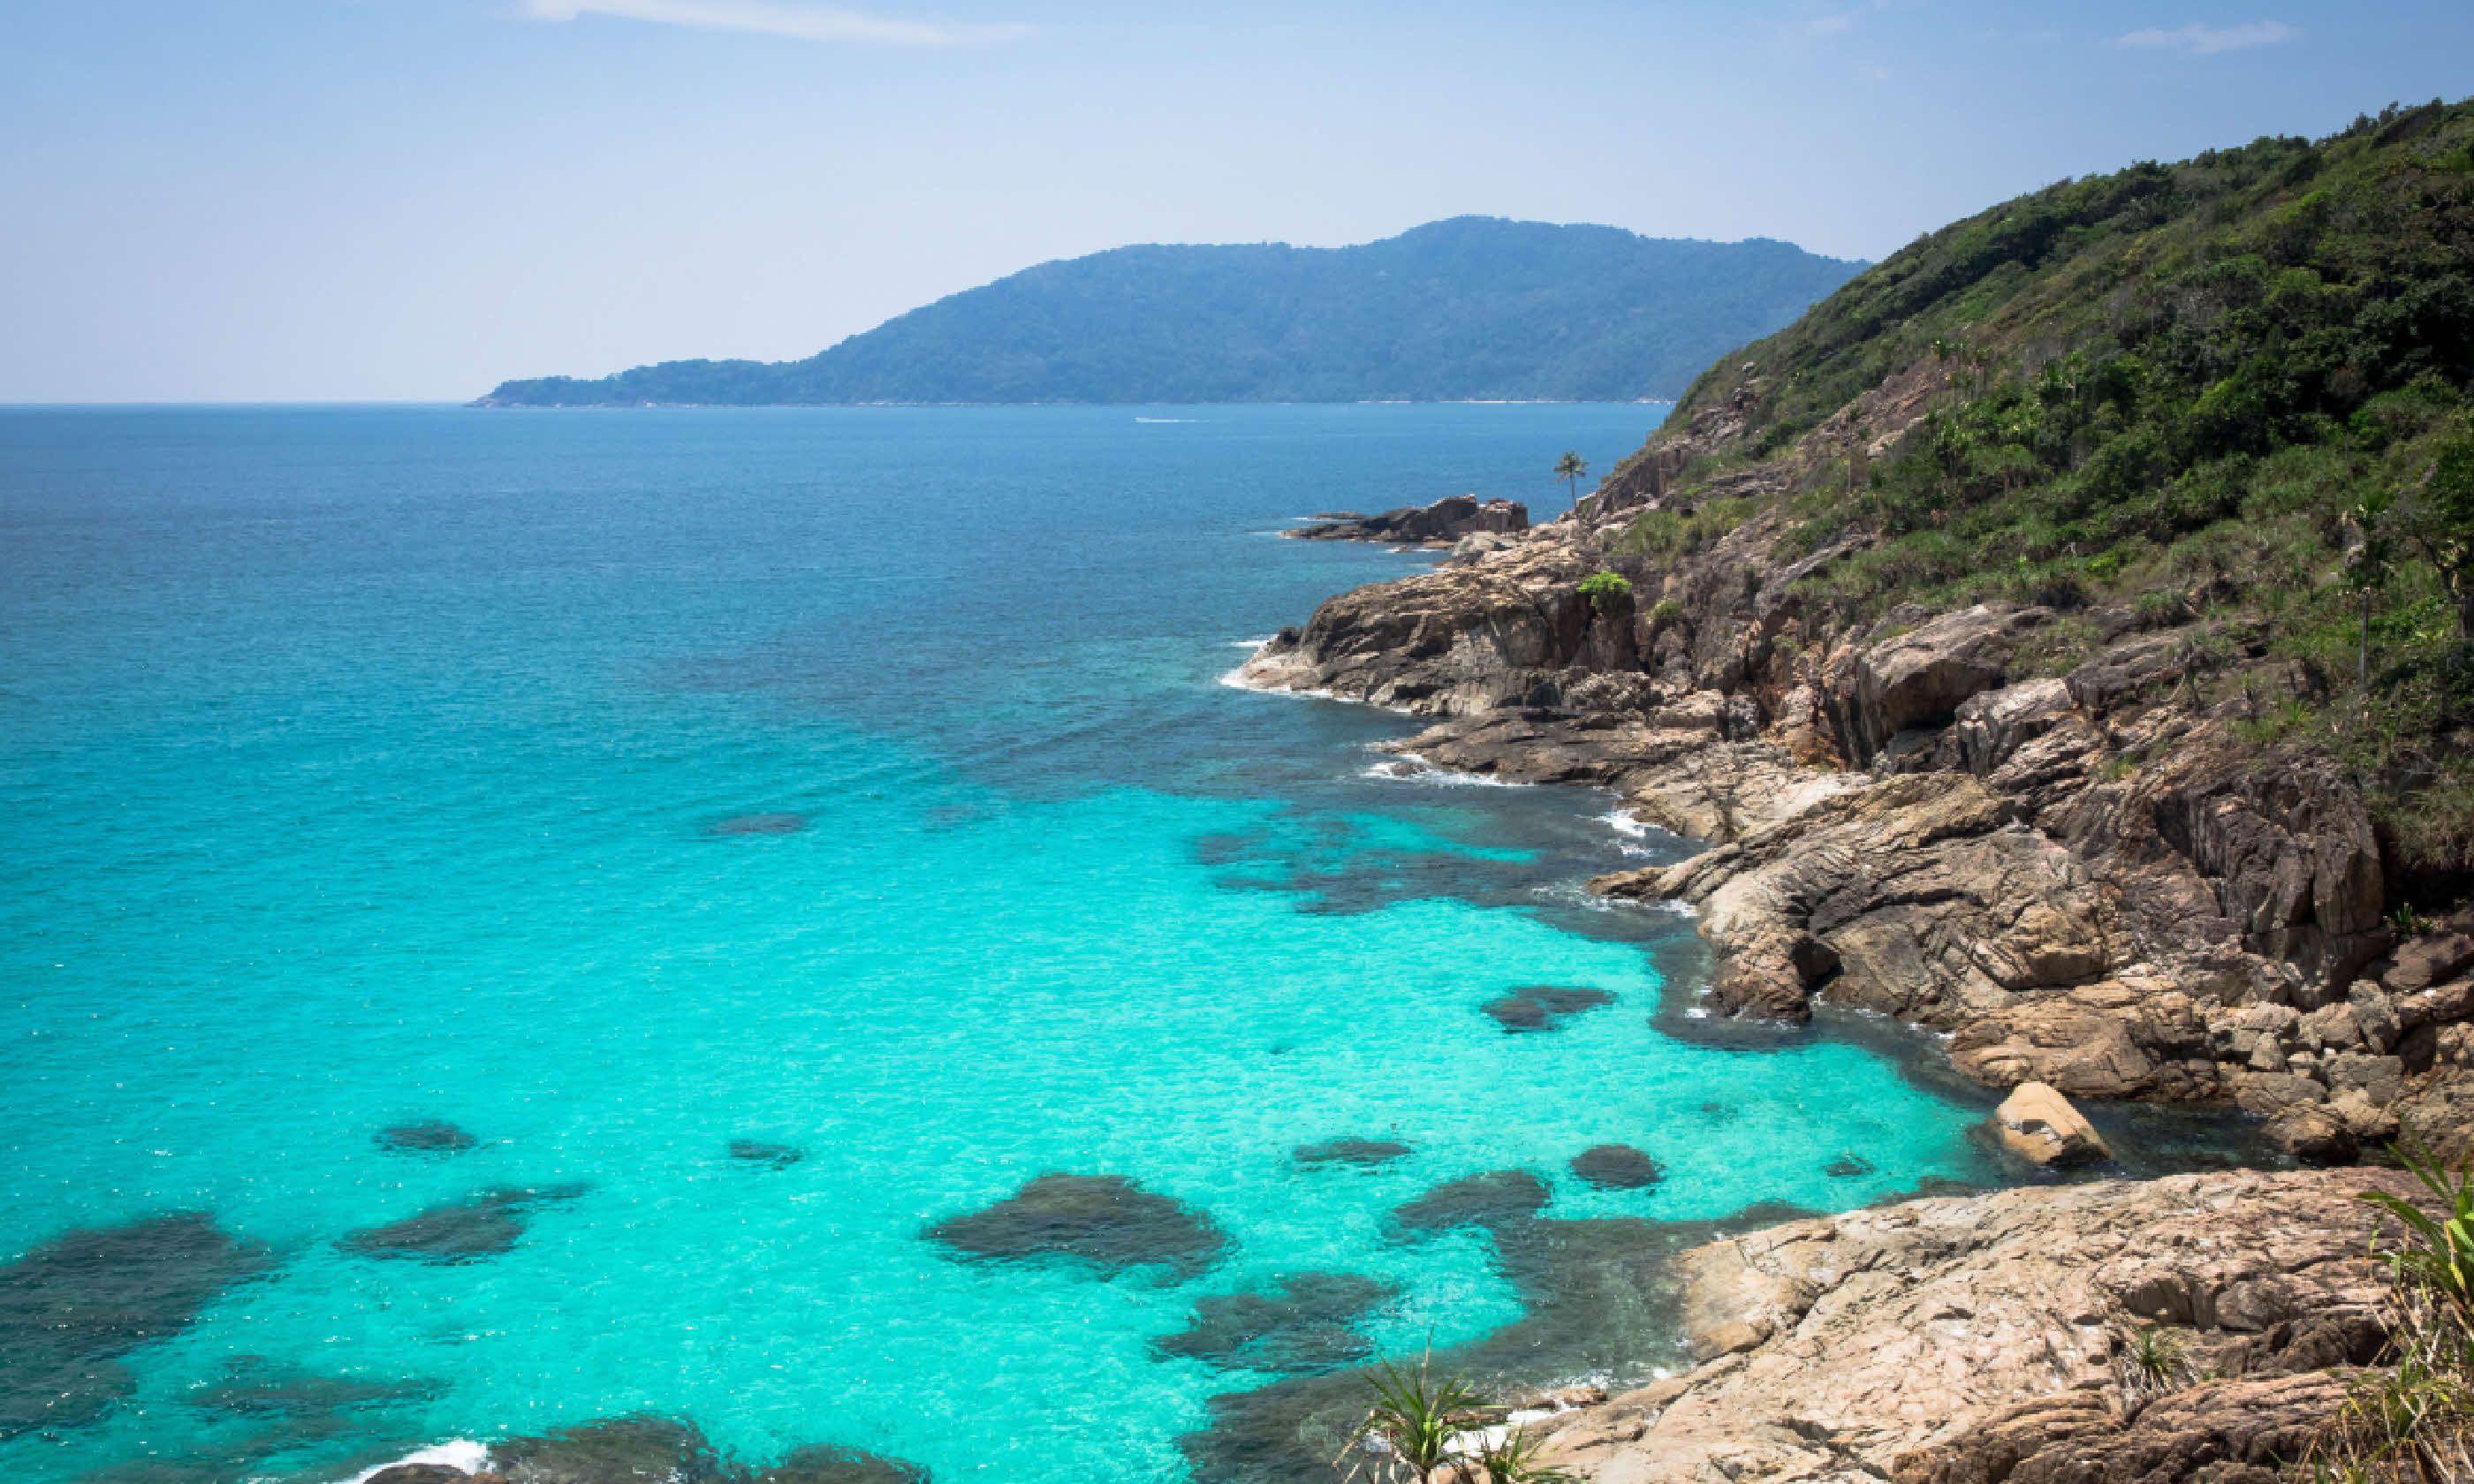 Pulau Perhentian Kecil island, Malaysia (Shutterstock)